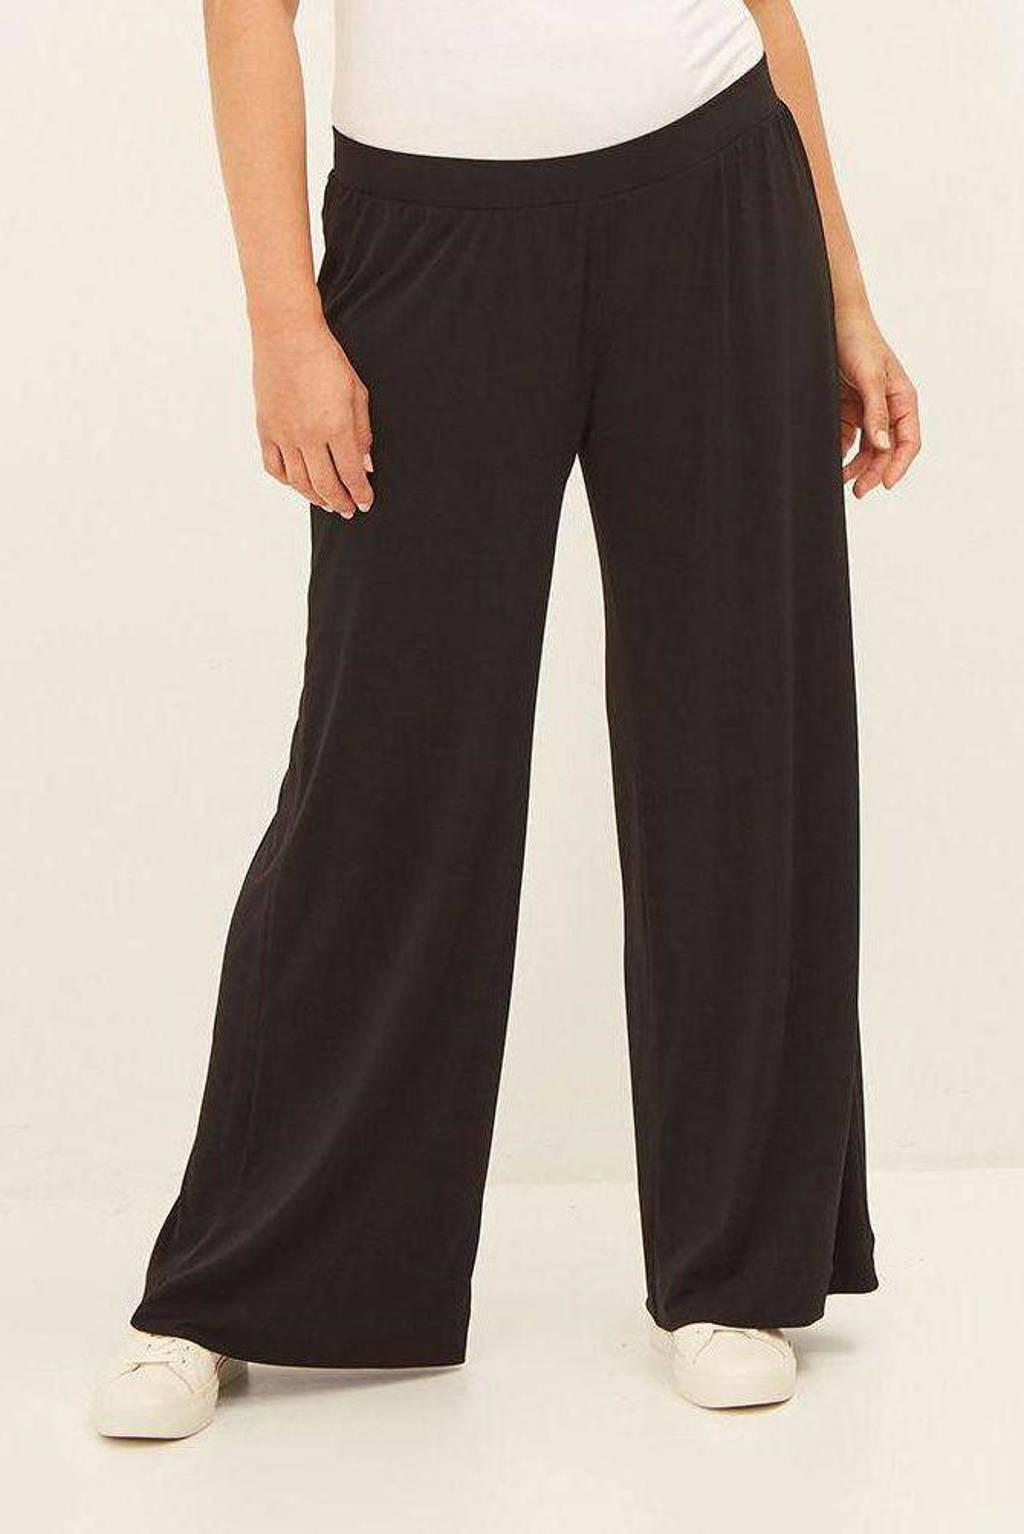 Mat Fashion wide leg palazzo broek zwart, Zwart